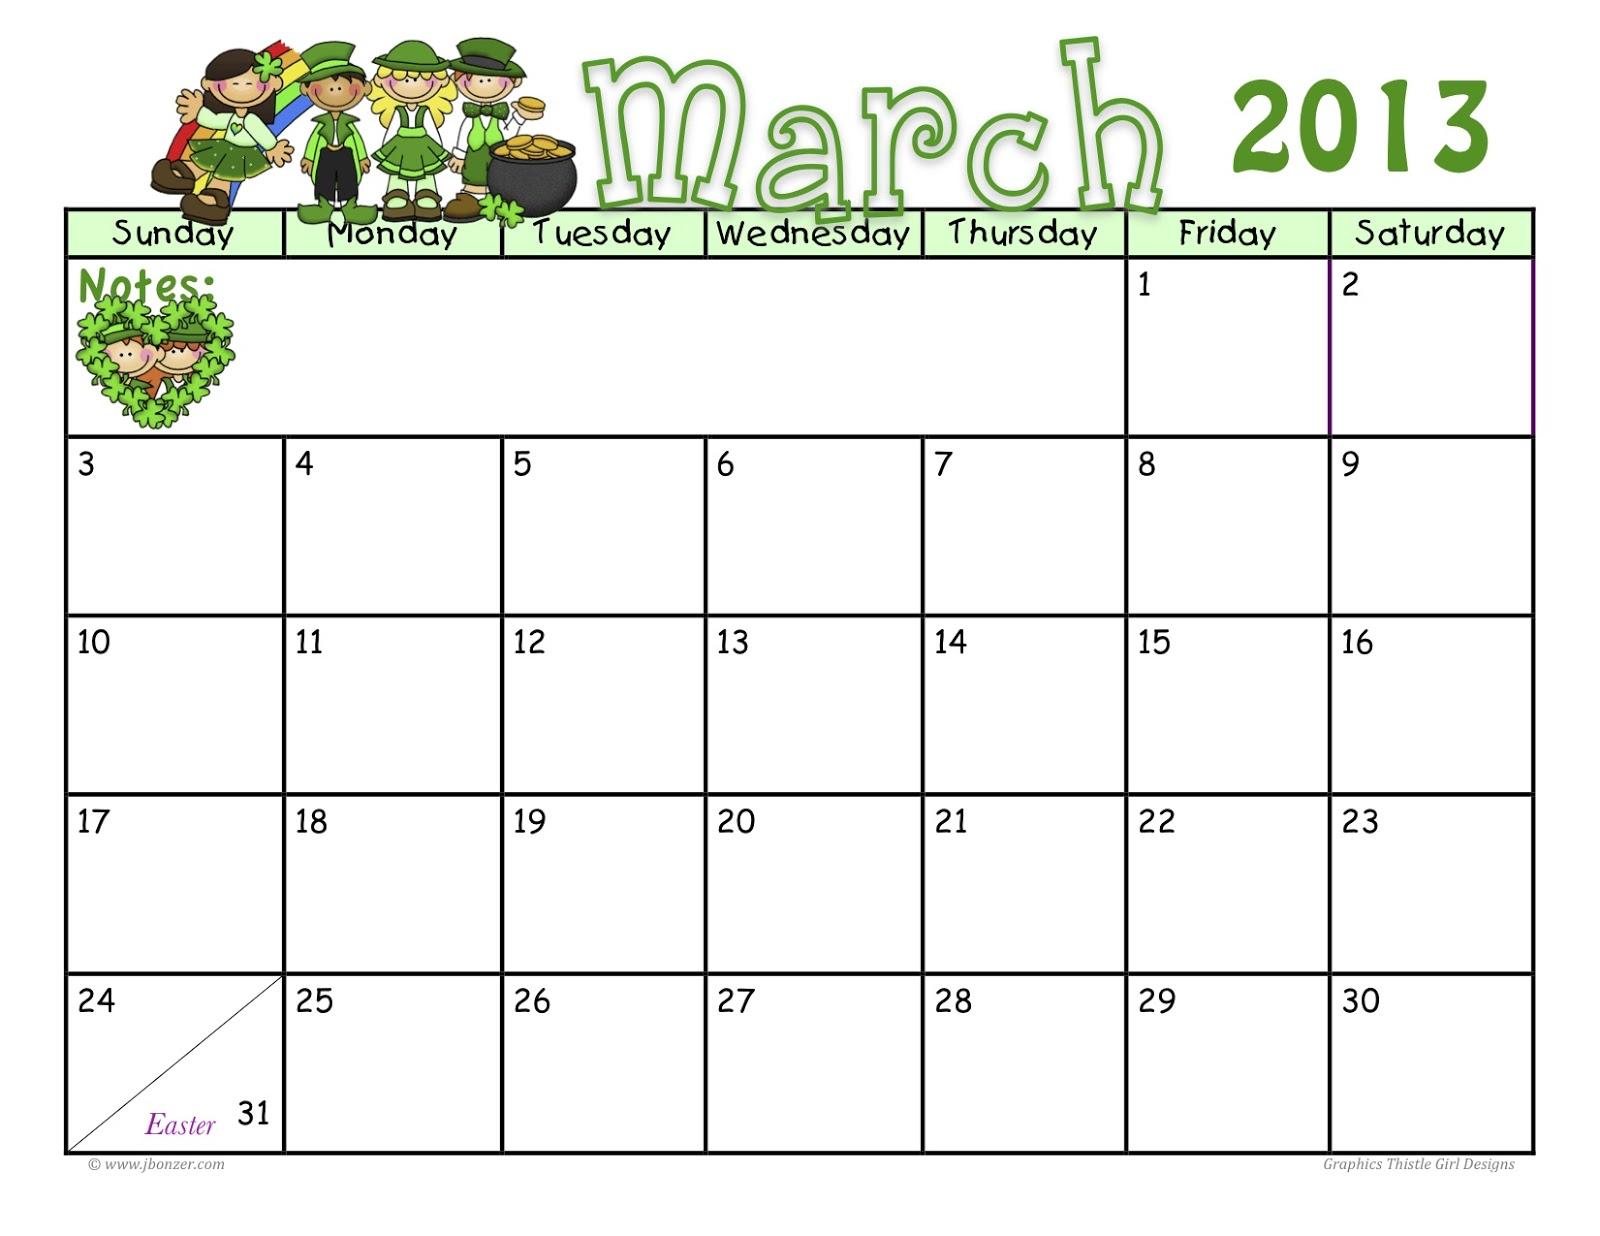 March 2013 Calendar | MyFreePrintable.com